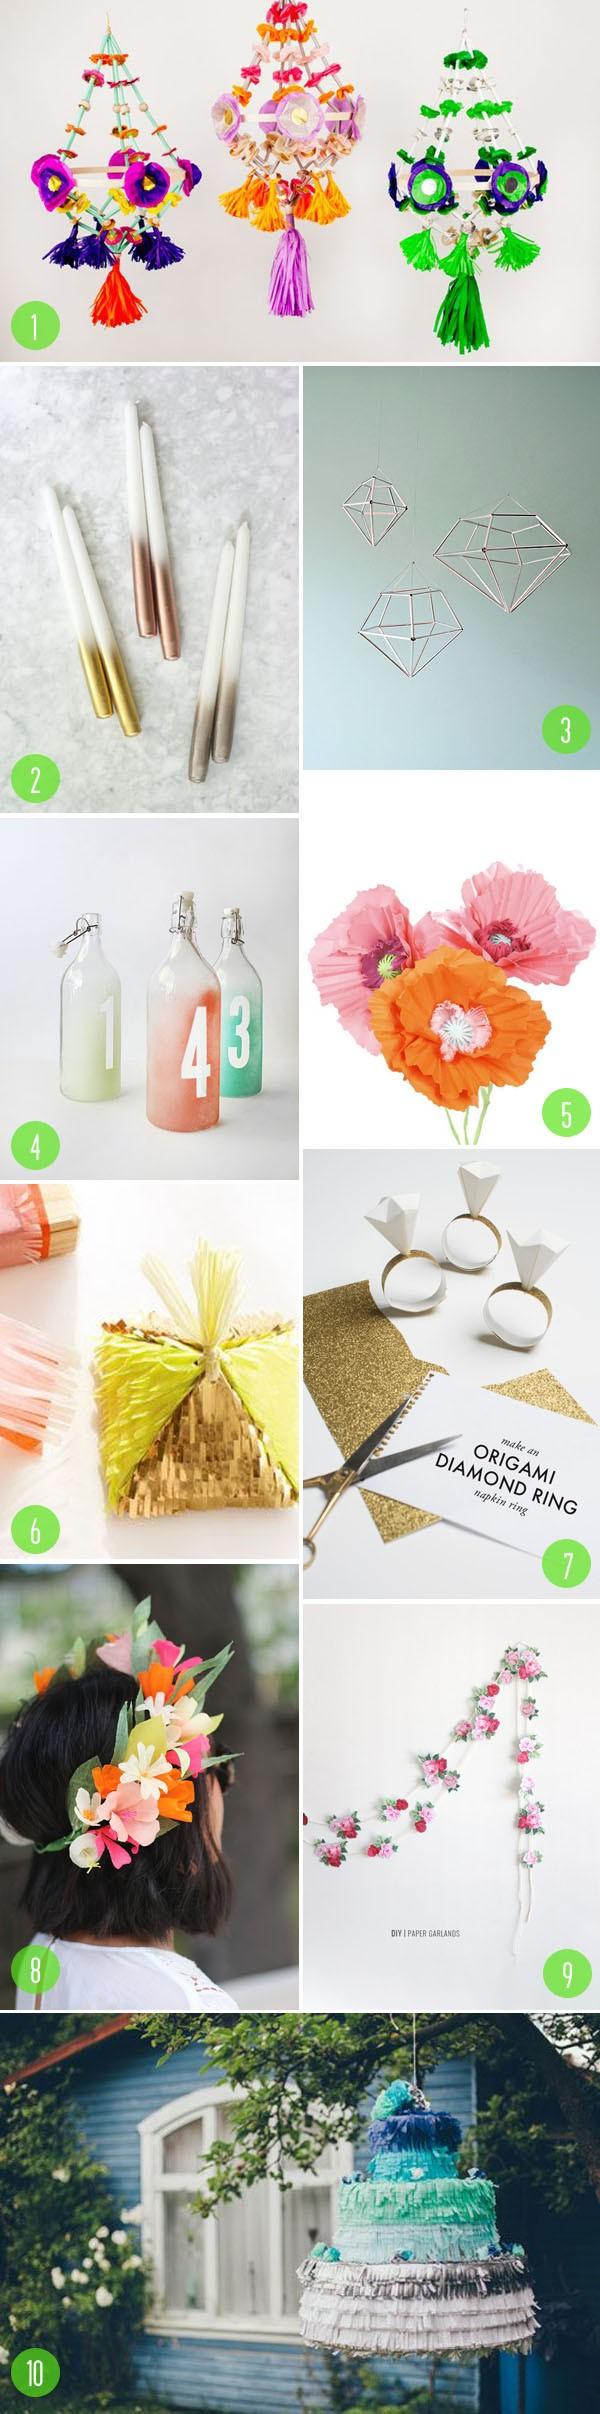 Top 10: wedding DIY projects